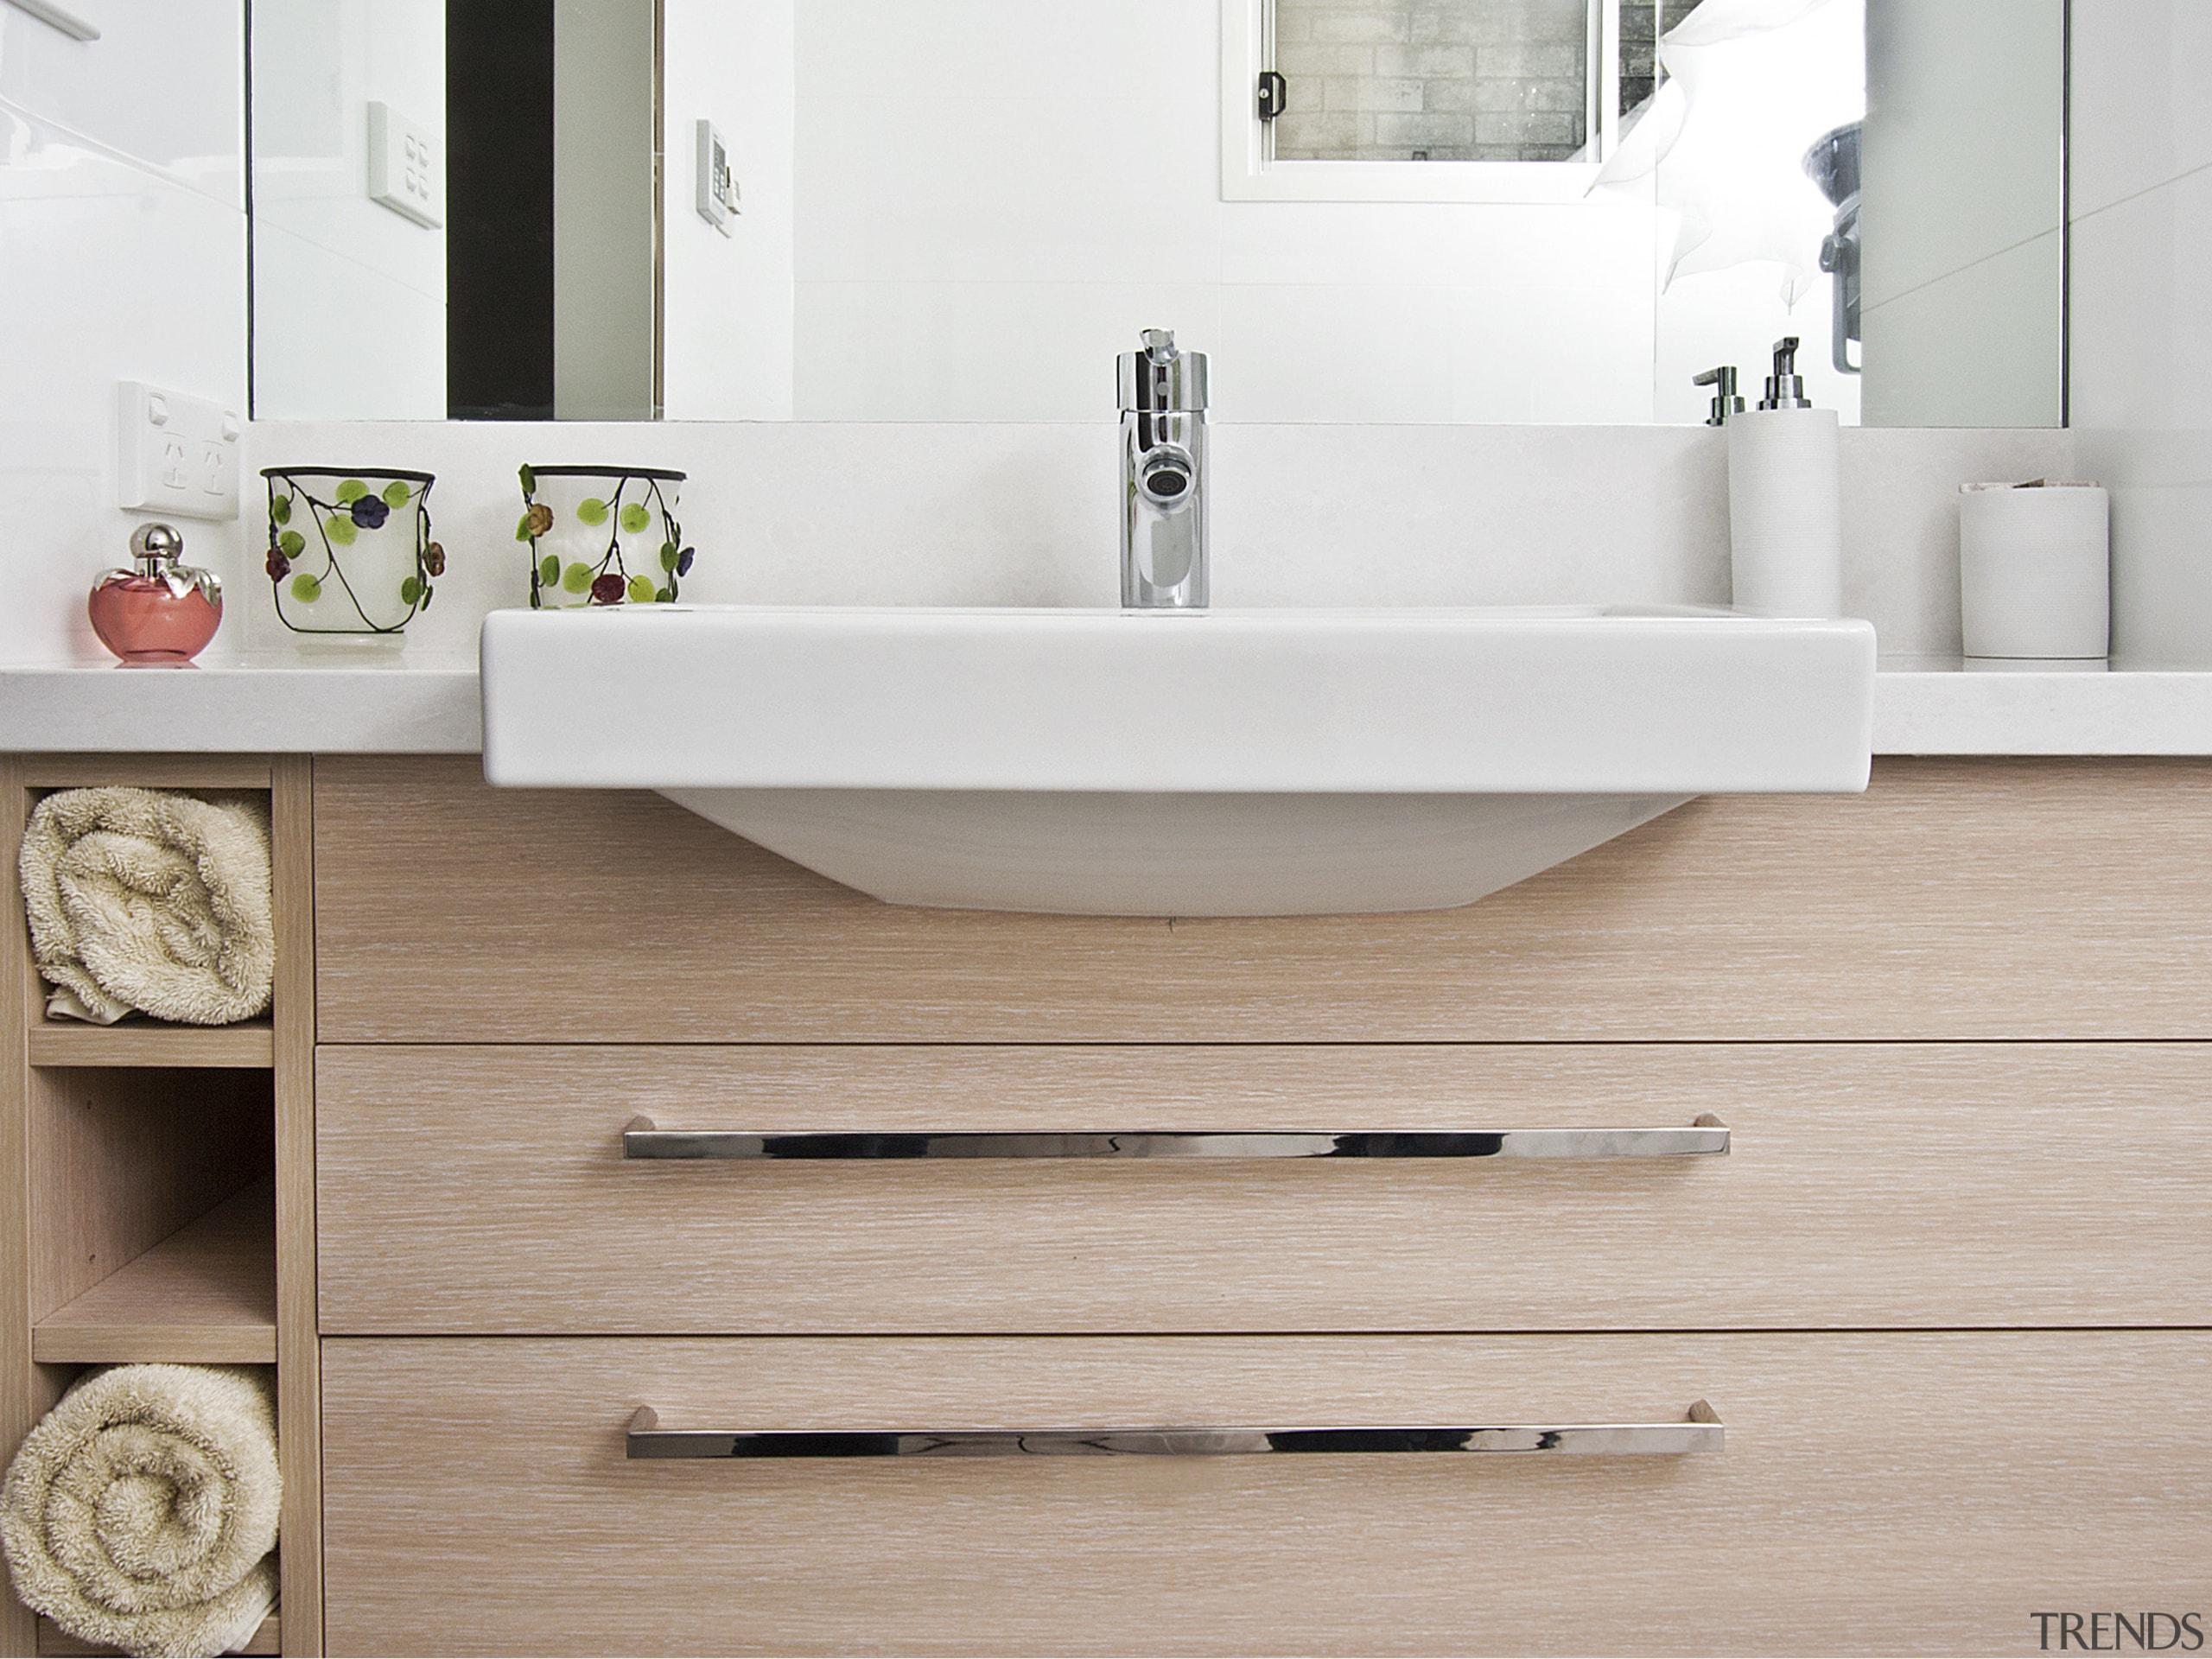 View of bathroom featuring wood floors, white bench bathroom, bathroom accessory, bathroom cabinet, bathroom sink, ceramic, floor, plumbing fixture, product design, sink, tap, gray